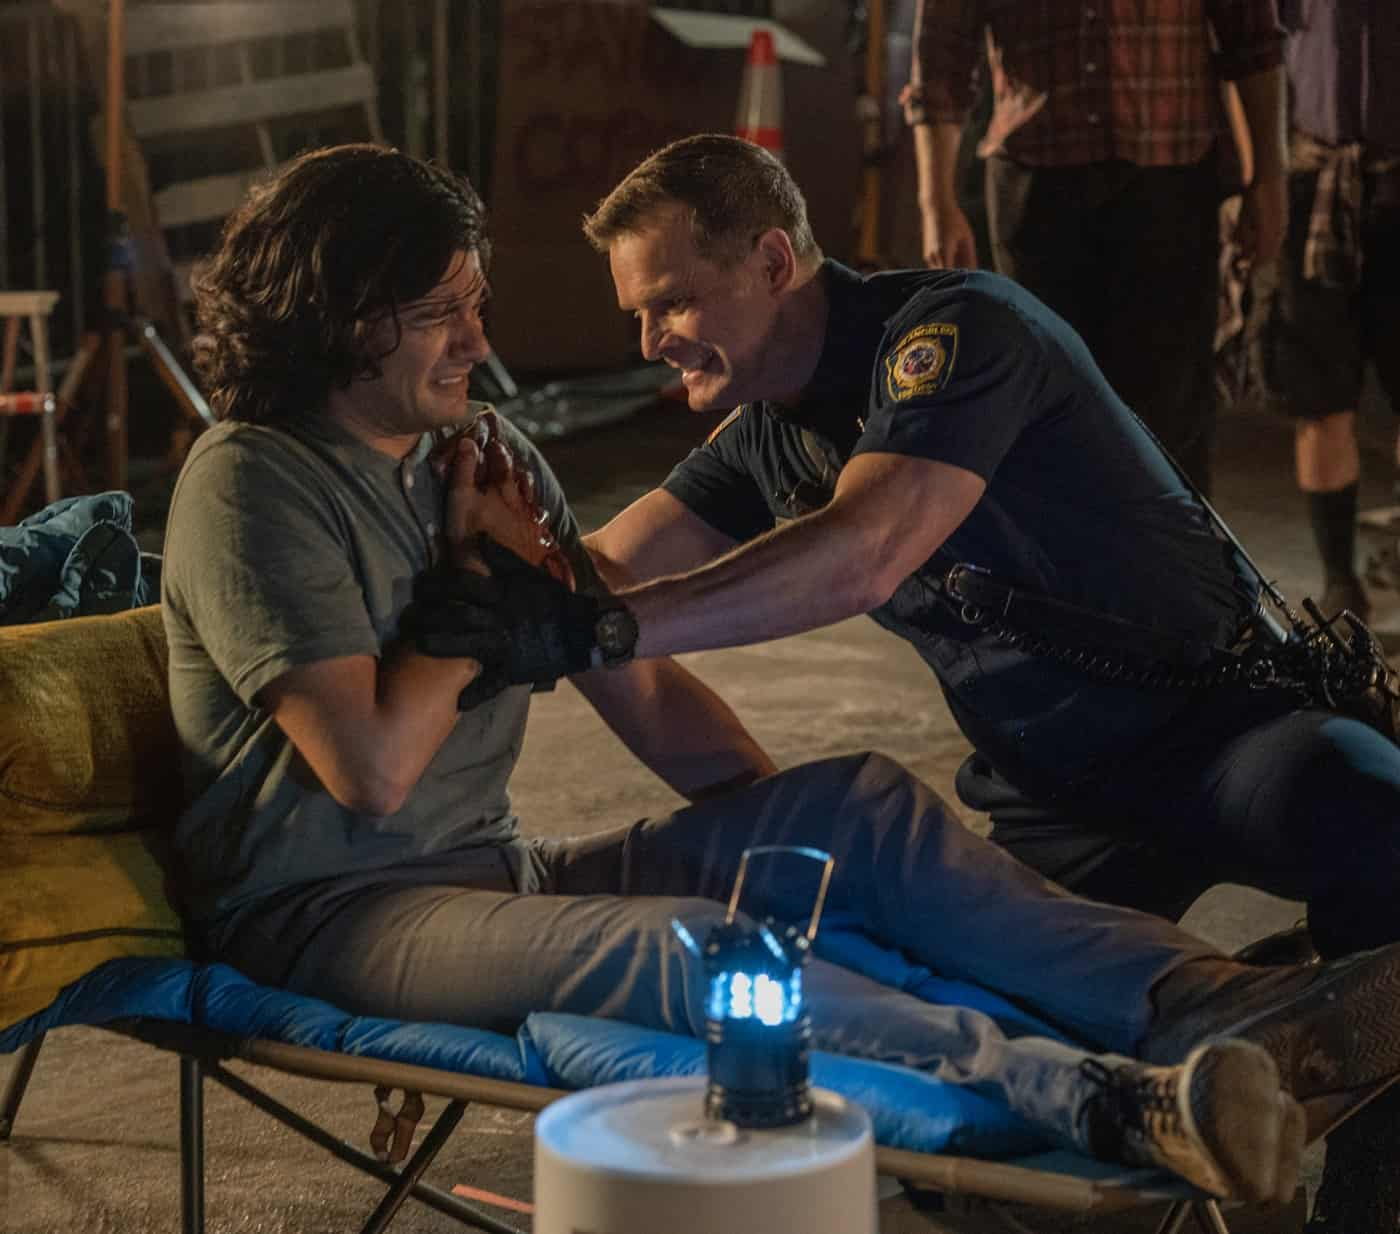 "911 Season 5 Episode 3 : Peter Krause (R) in the ""Desperate Measures"" episode of 9-1-1 airing Monday, Oct. 4 (8:00-9:00 PM ET/PT) on FOX. © 2021 FOX MEDIA LLC. CR: Jack Zeman /FOX."